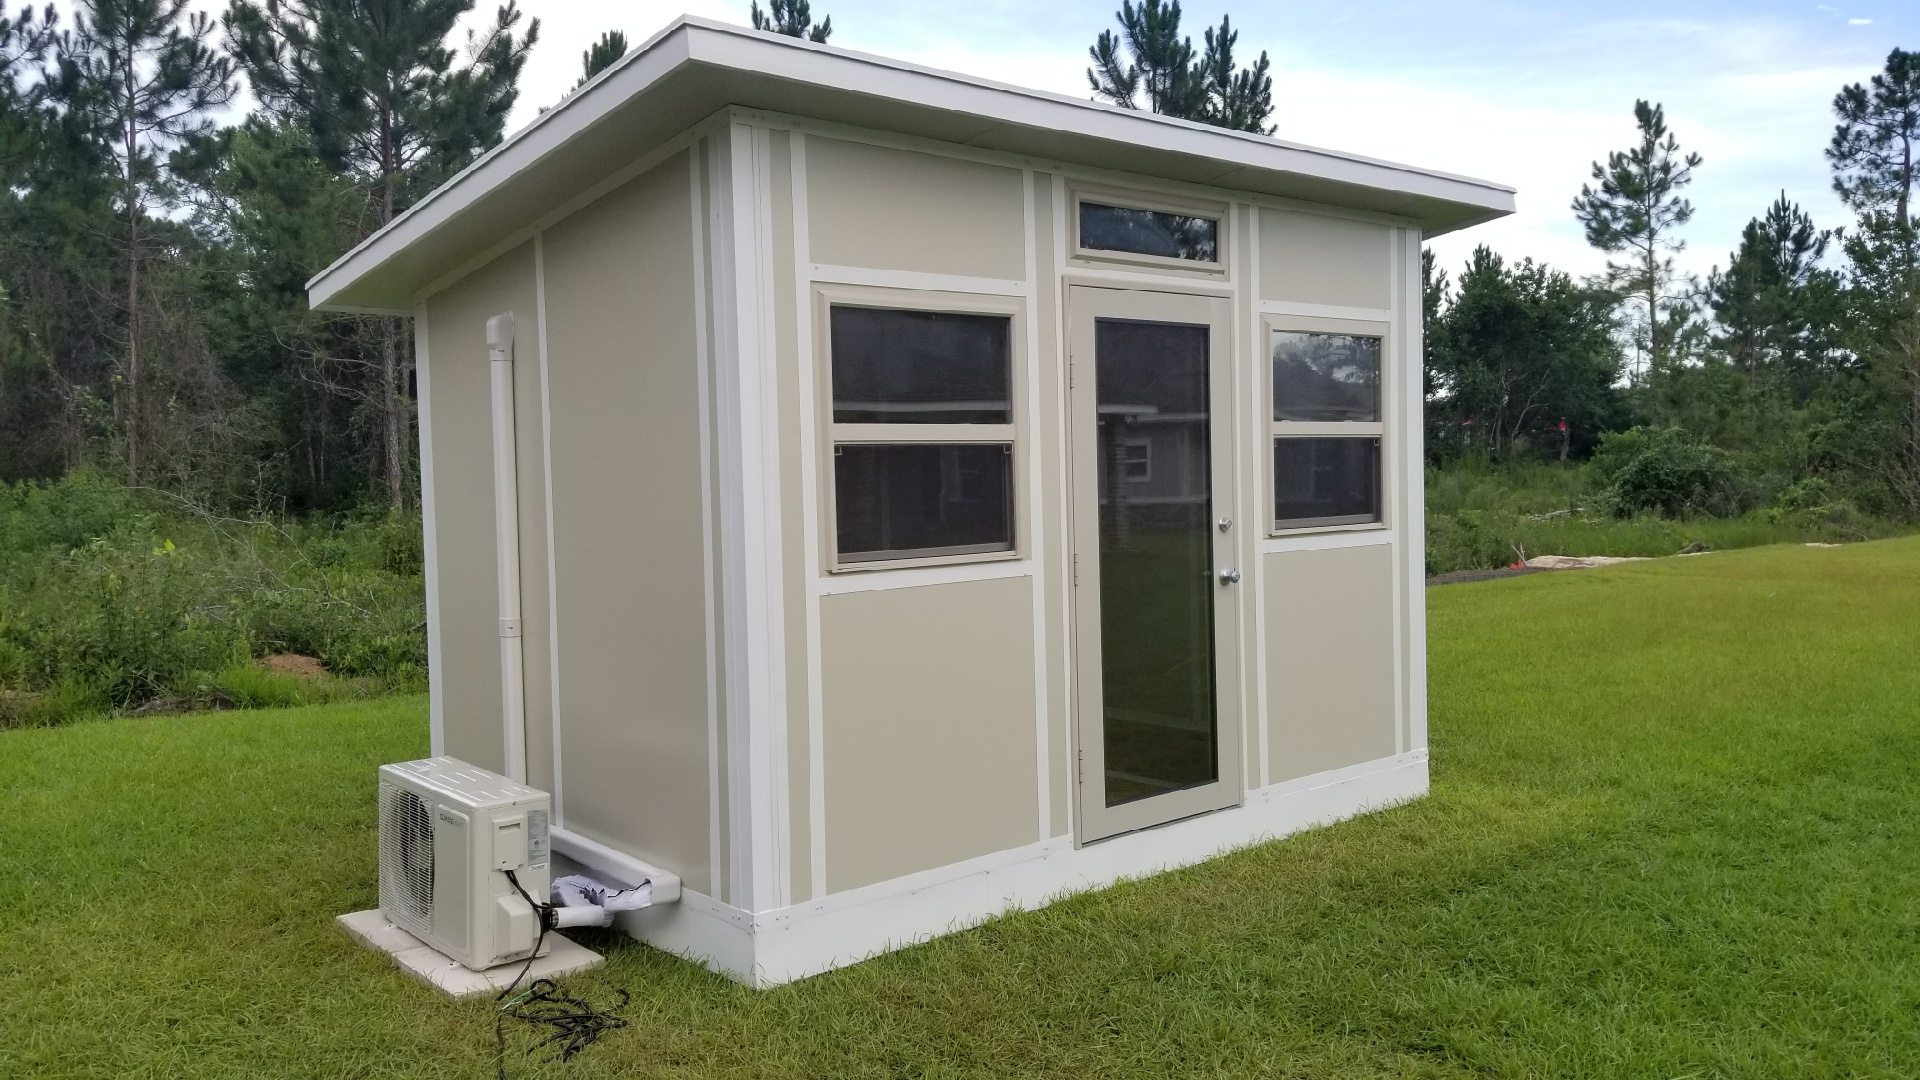 Blockhouse Shed Fort Walton Beach FL